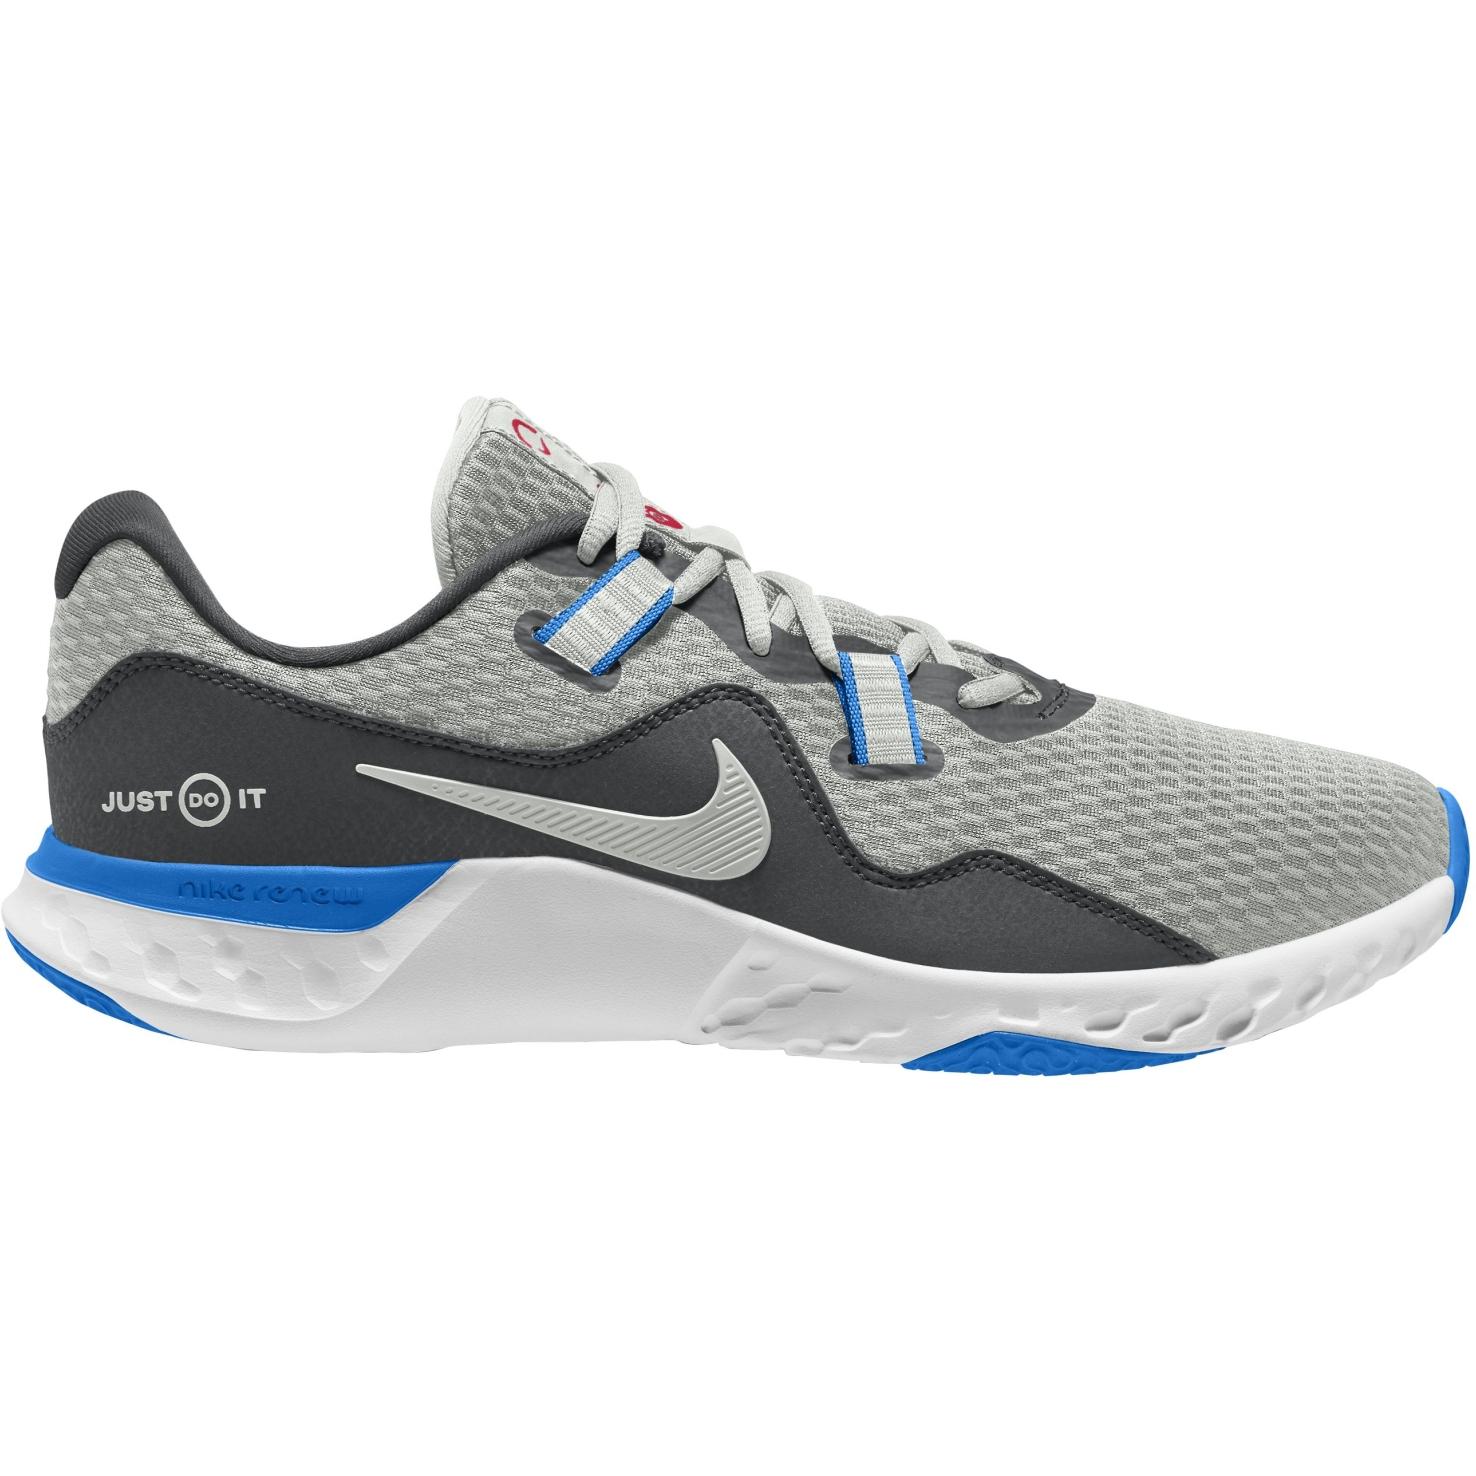 Produktbild von Nike Renew Retaliation TR 2 Herren Trainingsschuhe - grey fog/grey fog-iron grey-photo blue CK5074-014